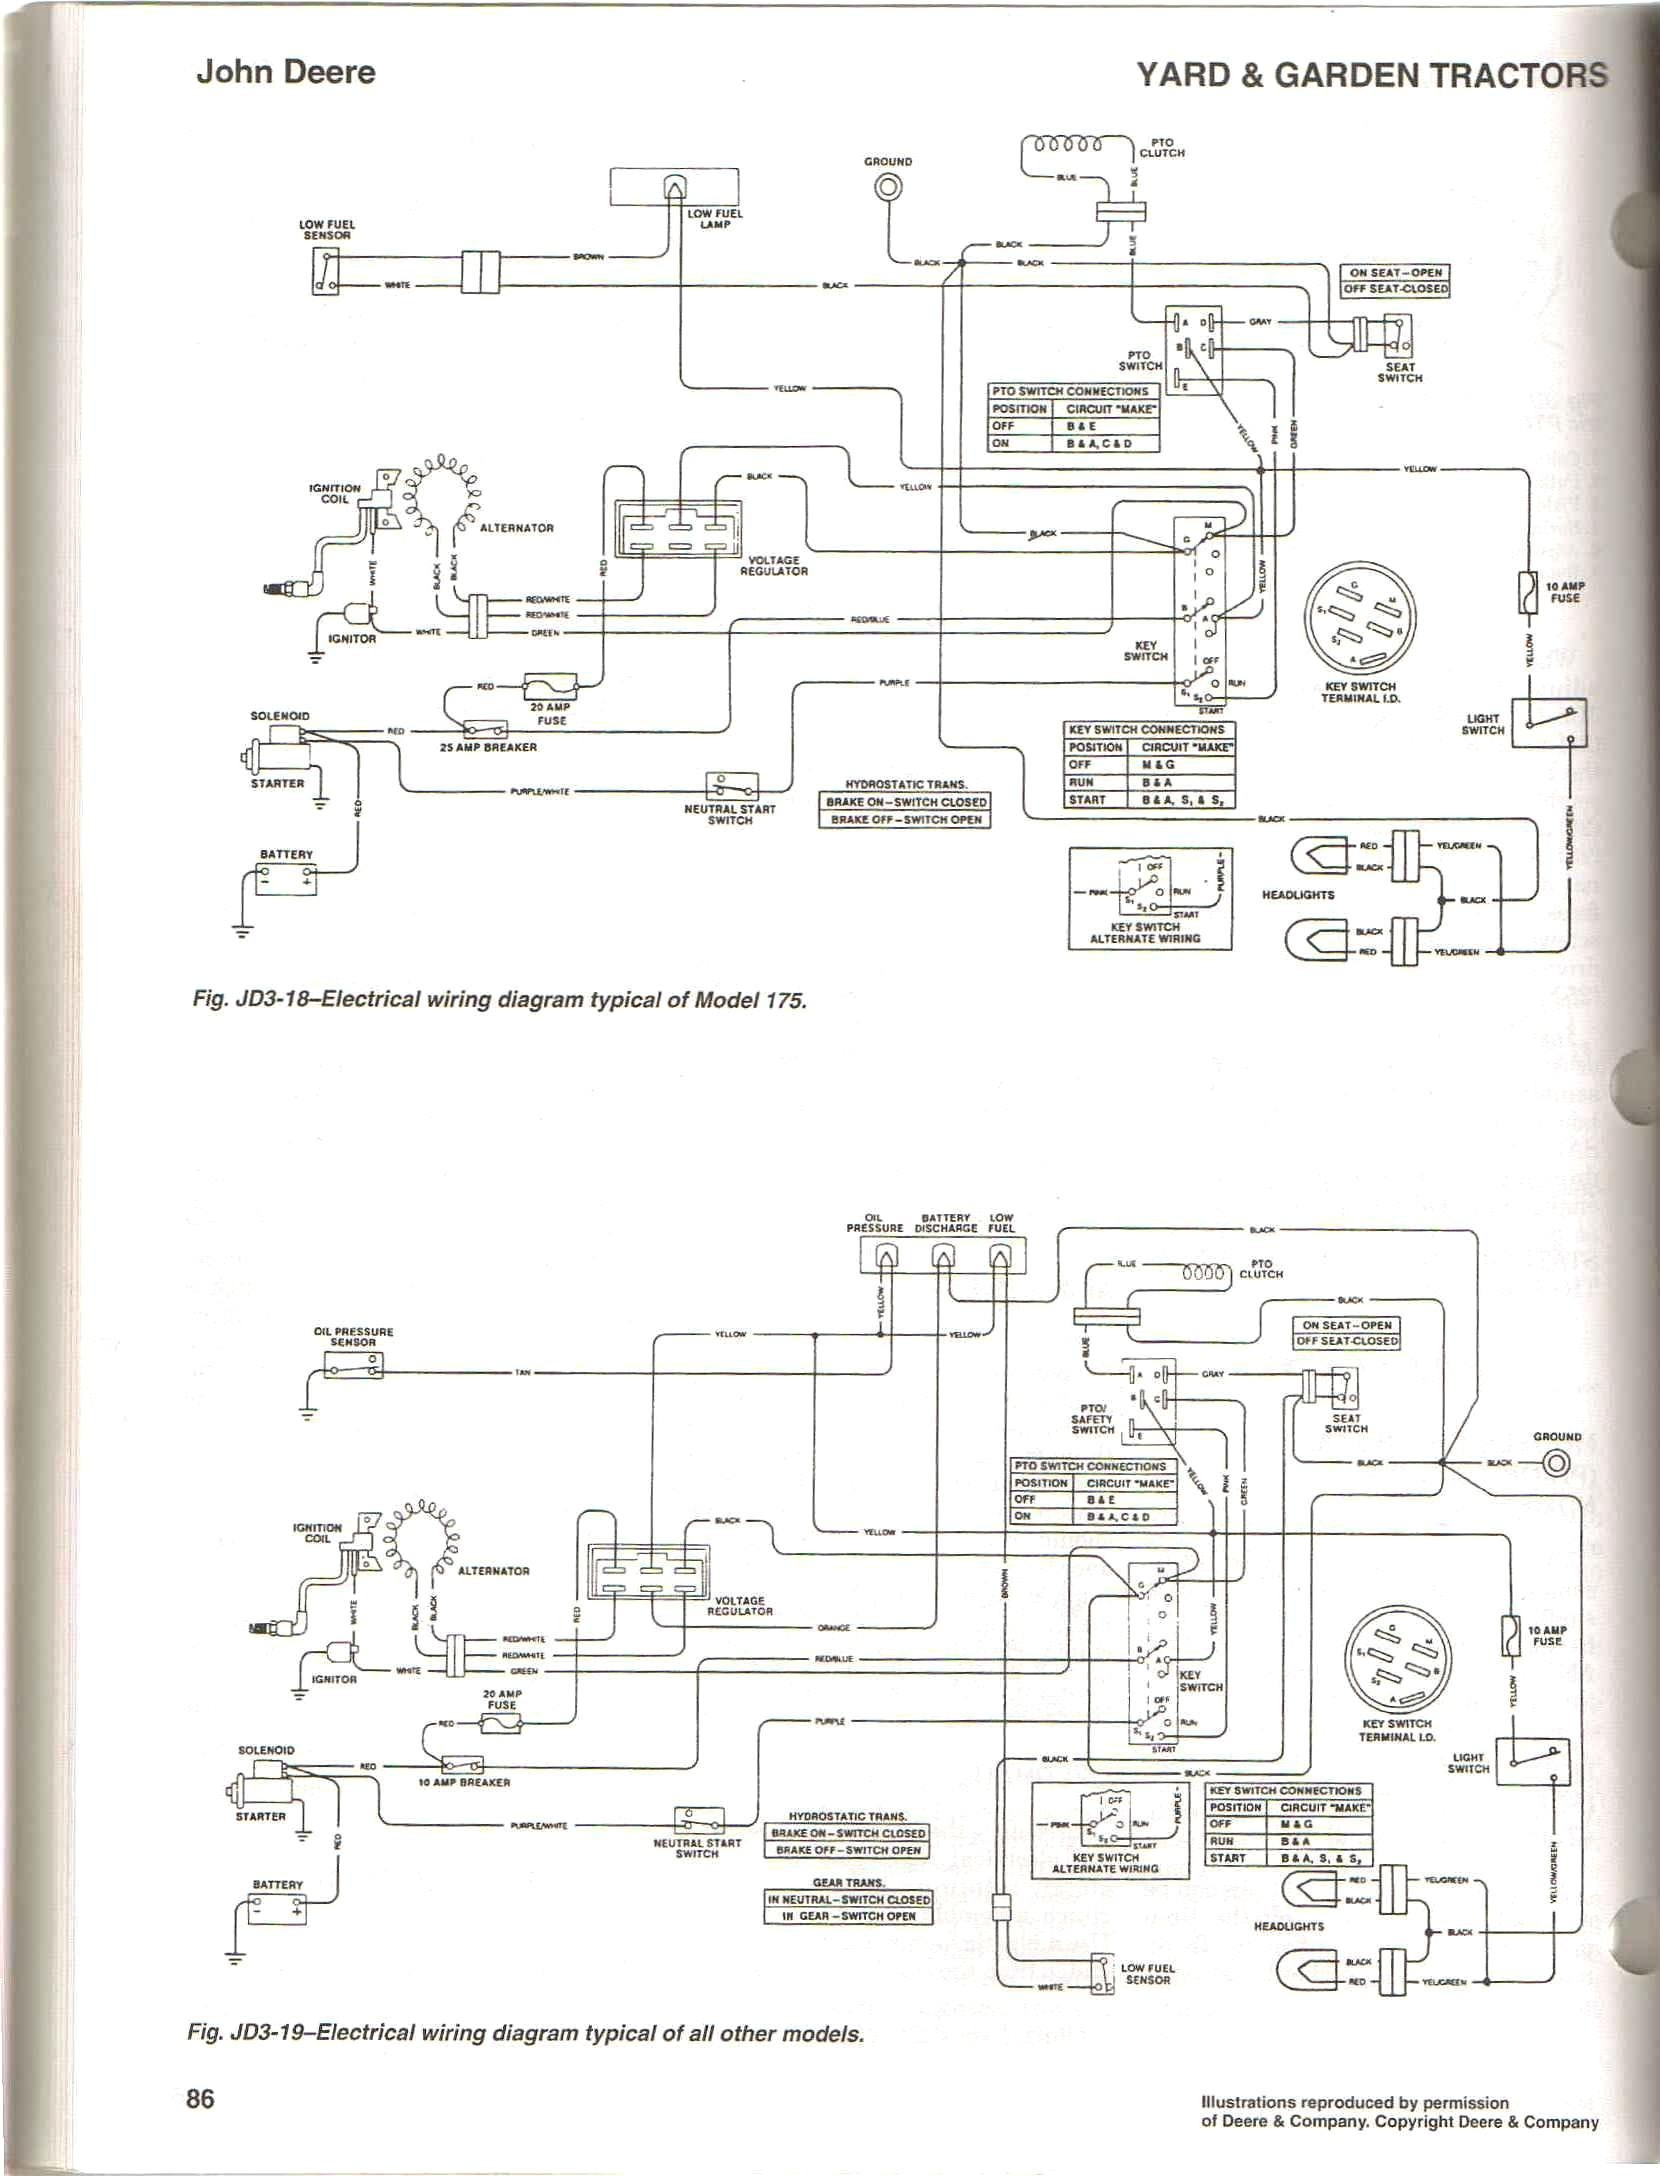 hight resolution of john deere f525 wiring diagram wiring diagram for john deere f525 refrence nett john deere